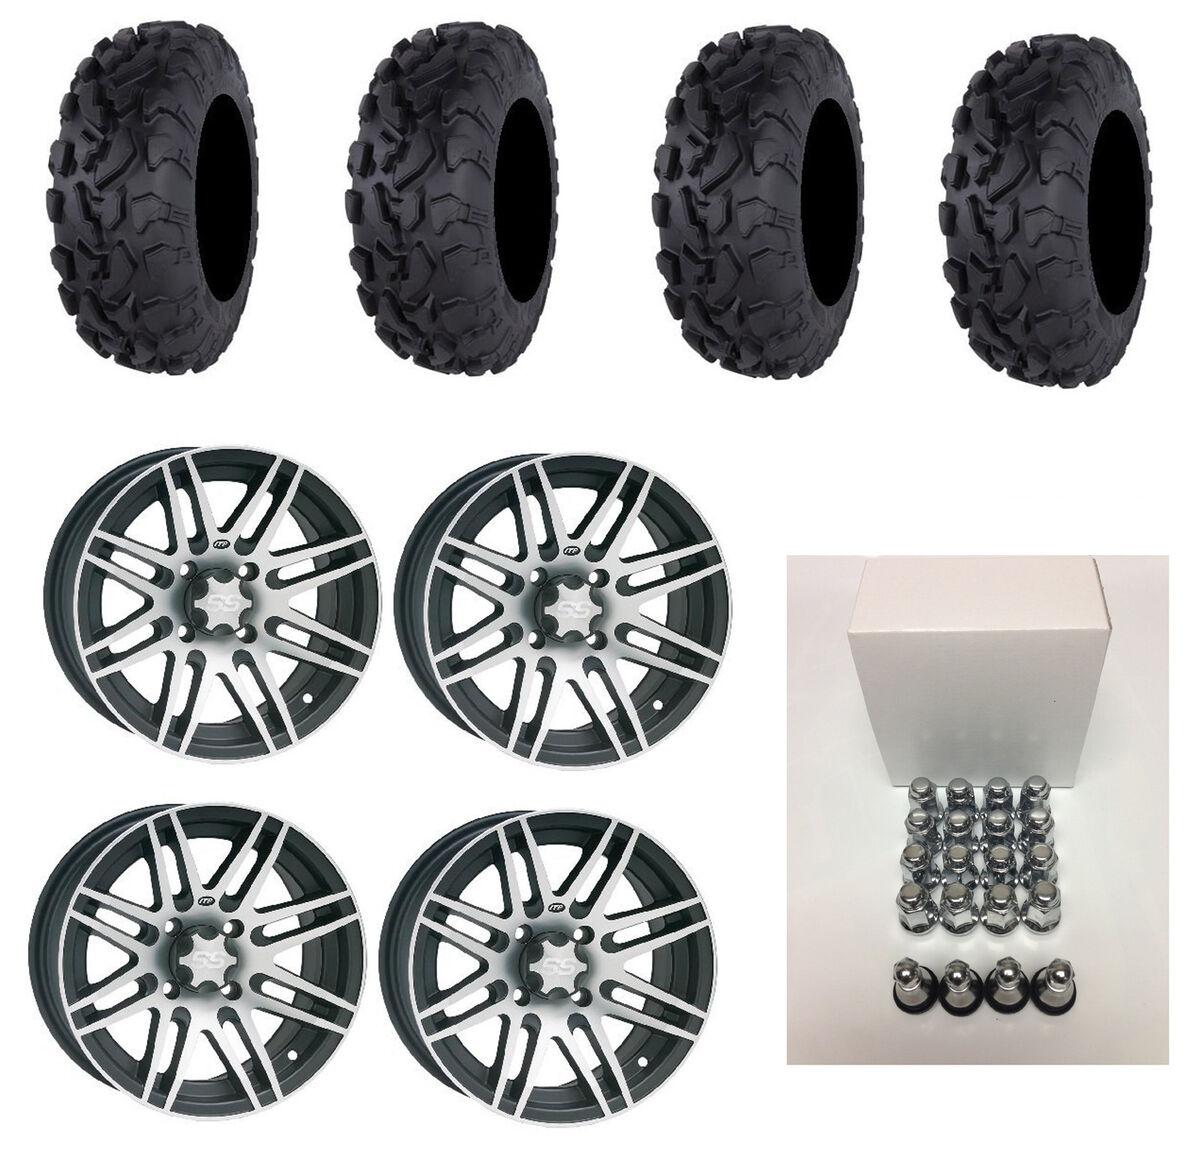 ITP SS316 14X7 Wheels Black Machined SR439 30x10 14 Bajacross Tires Arctic Cat